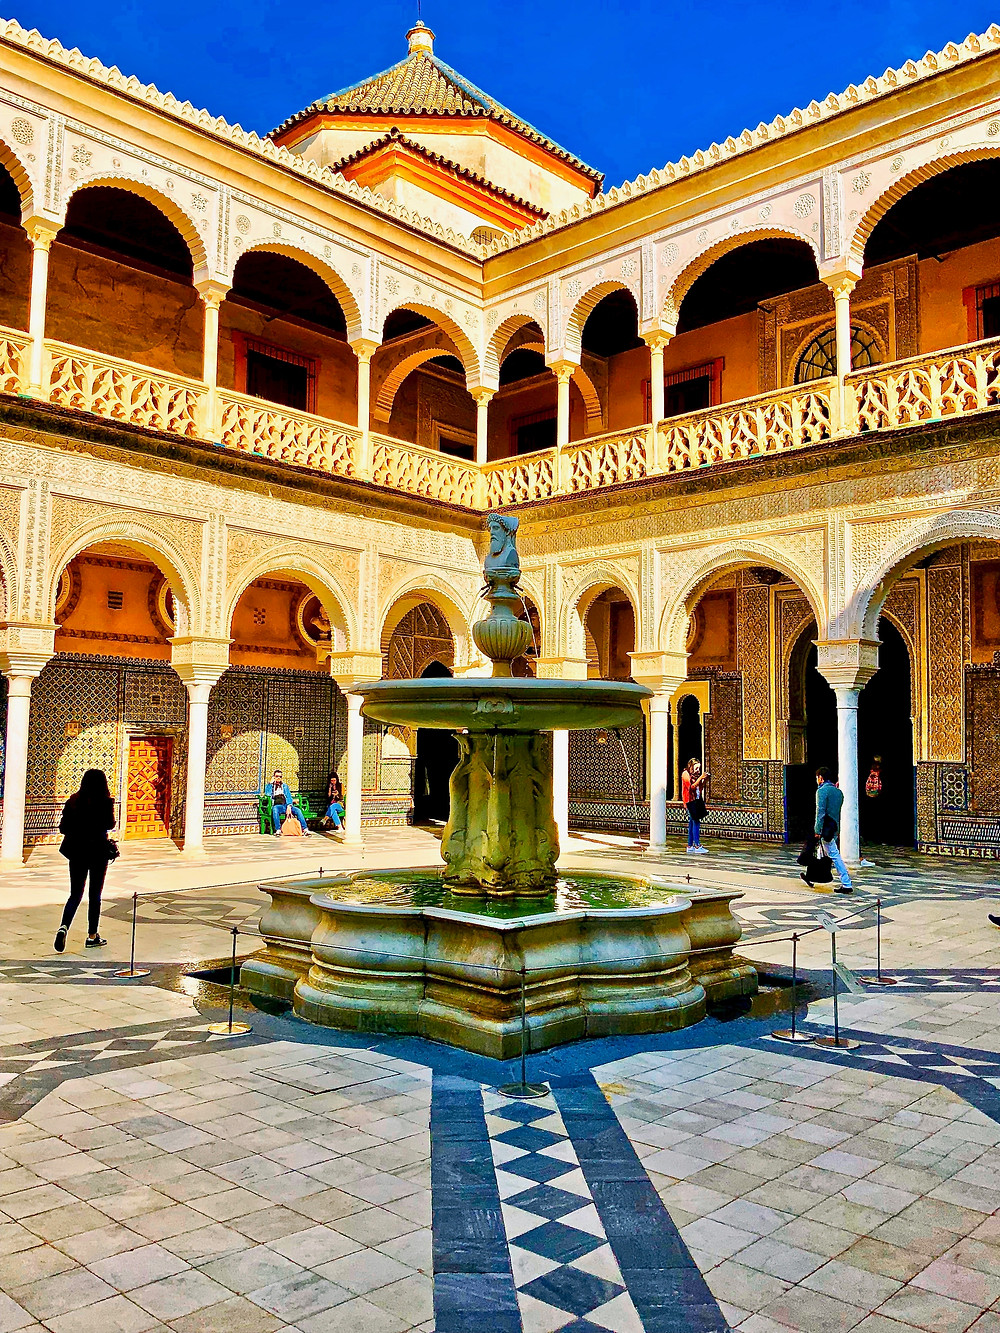 the sumptuous 16th century Andalusian palace, Casa de Pilatos in Seville